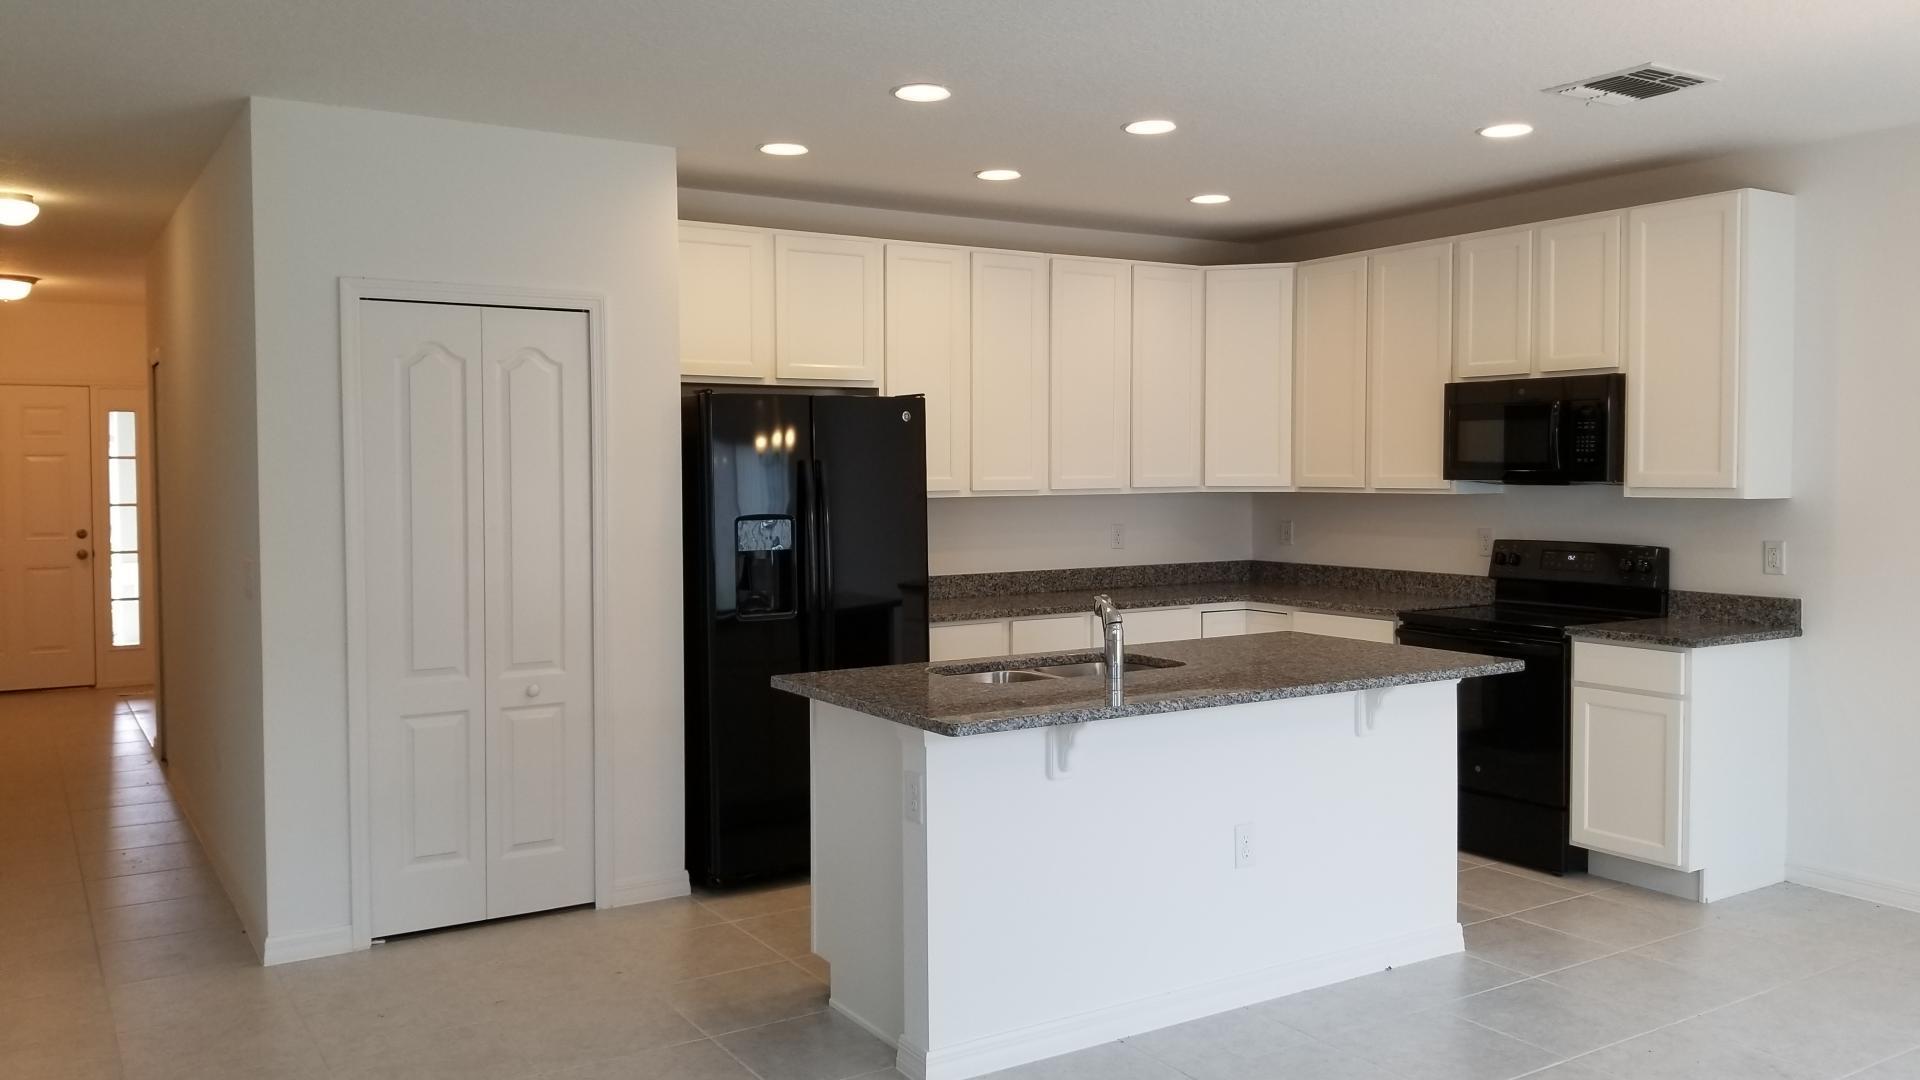 Kitchen featured in the Avella By Maronda Homes in Daytona Beach, FL